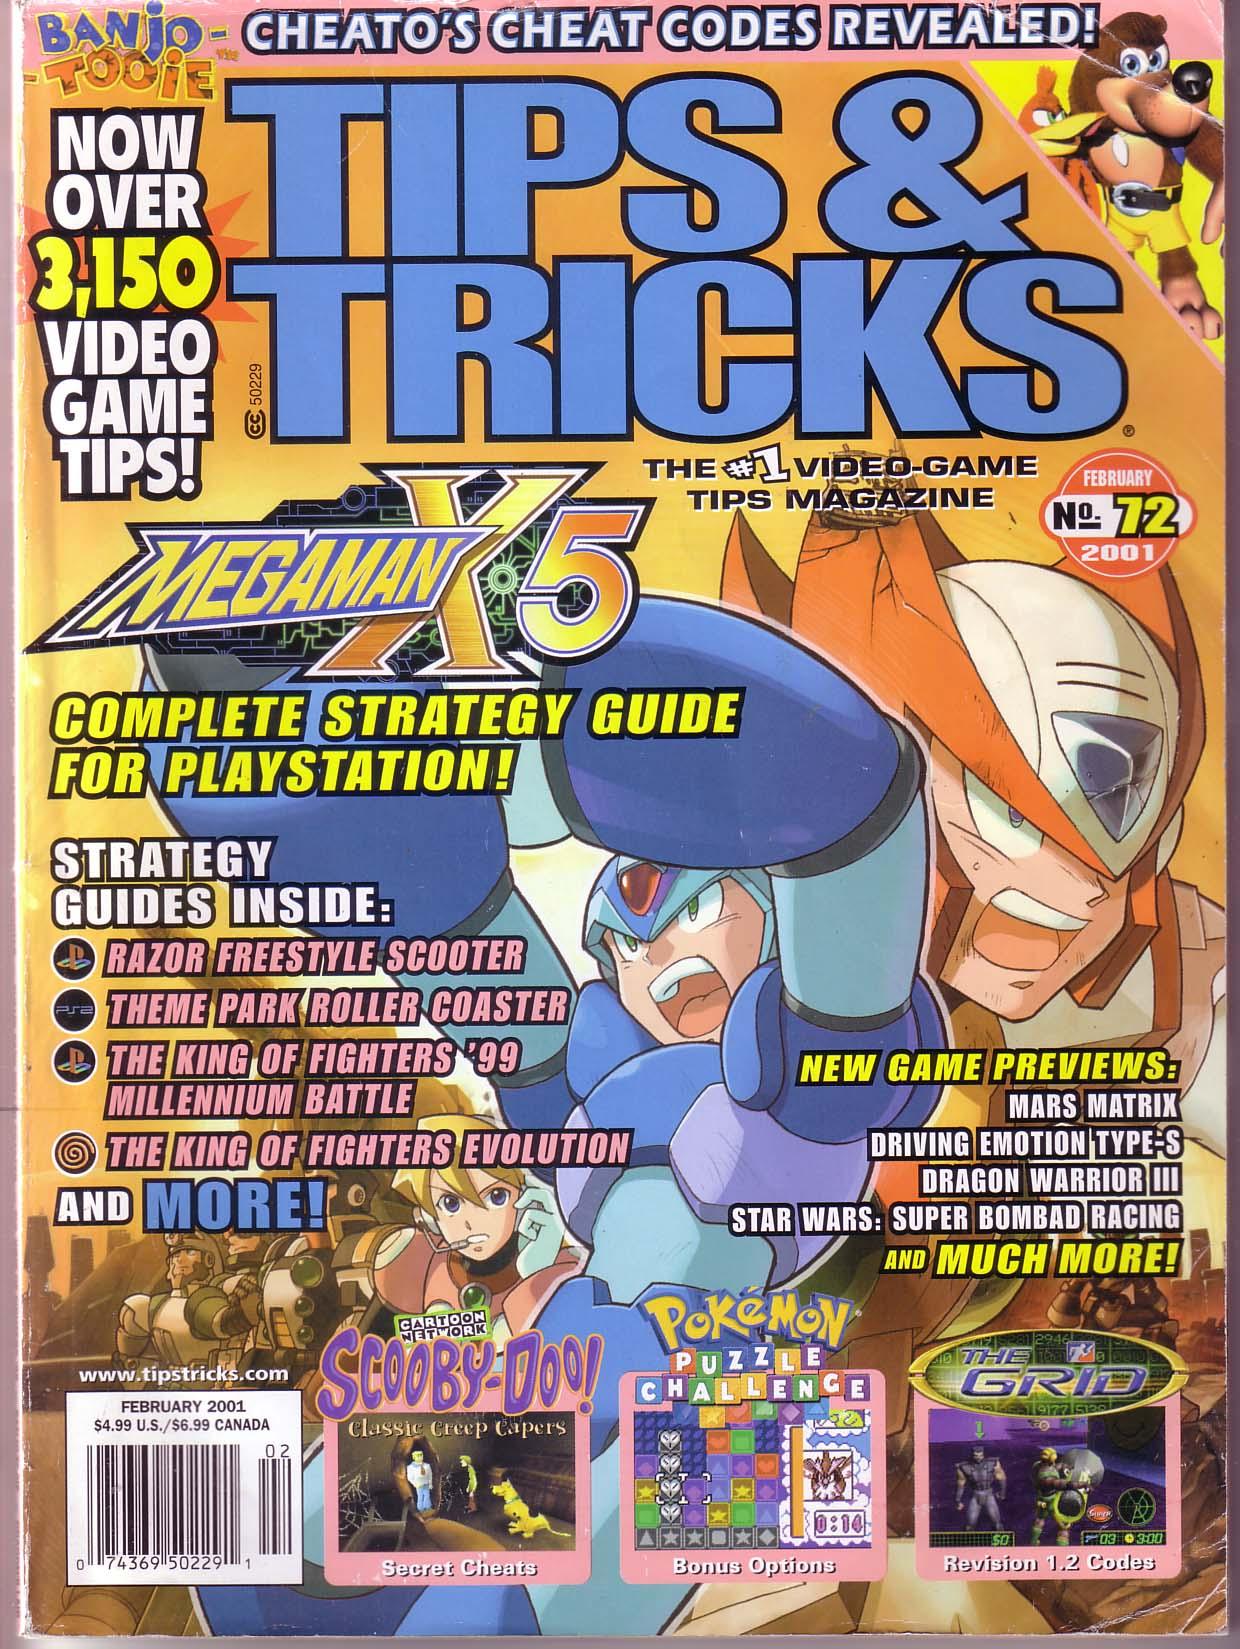 TipsandTricks_Feb_2001_ScoobyDoo_Strategy.jpg